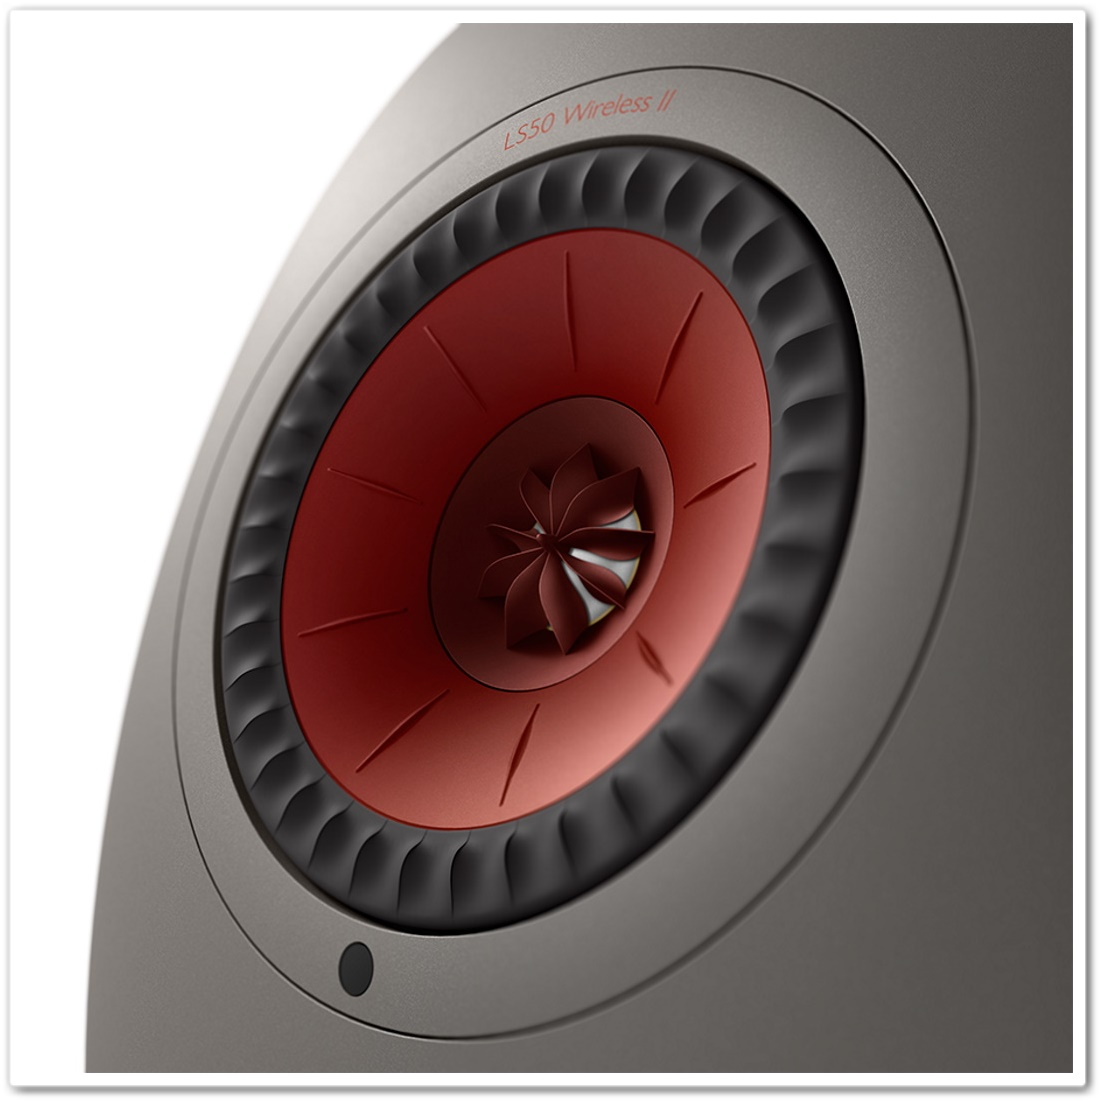 kef-ls-50-wireless_camarossaudio (4).jpg